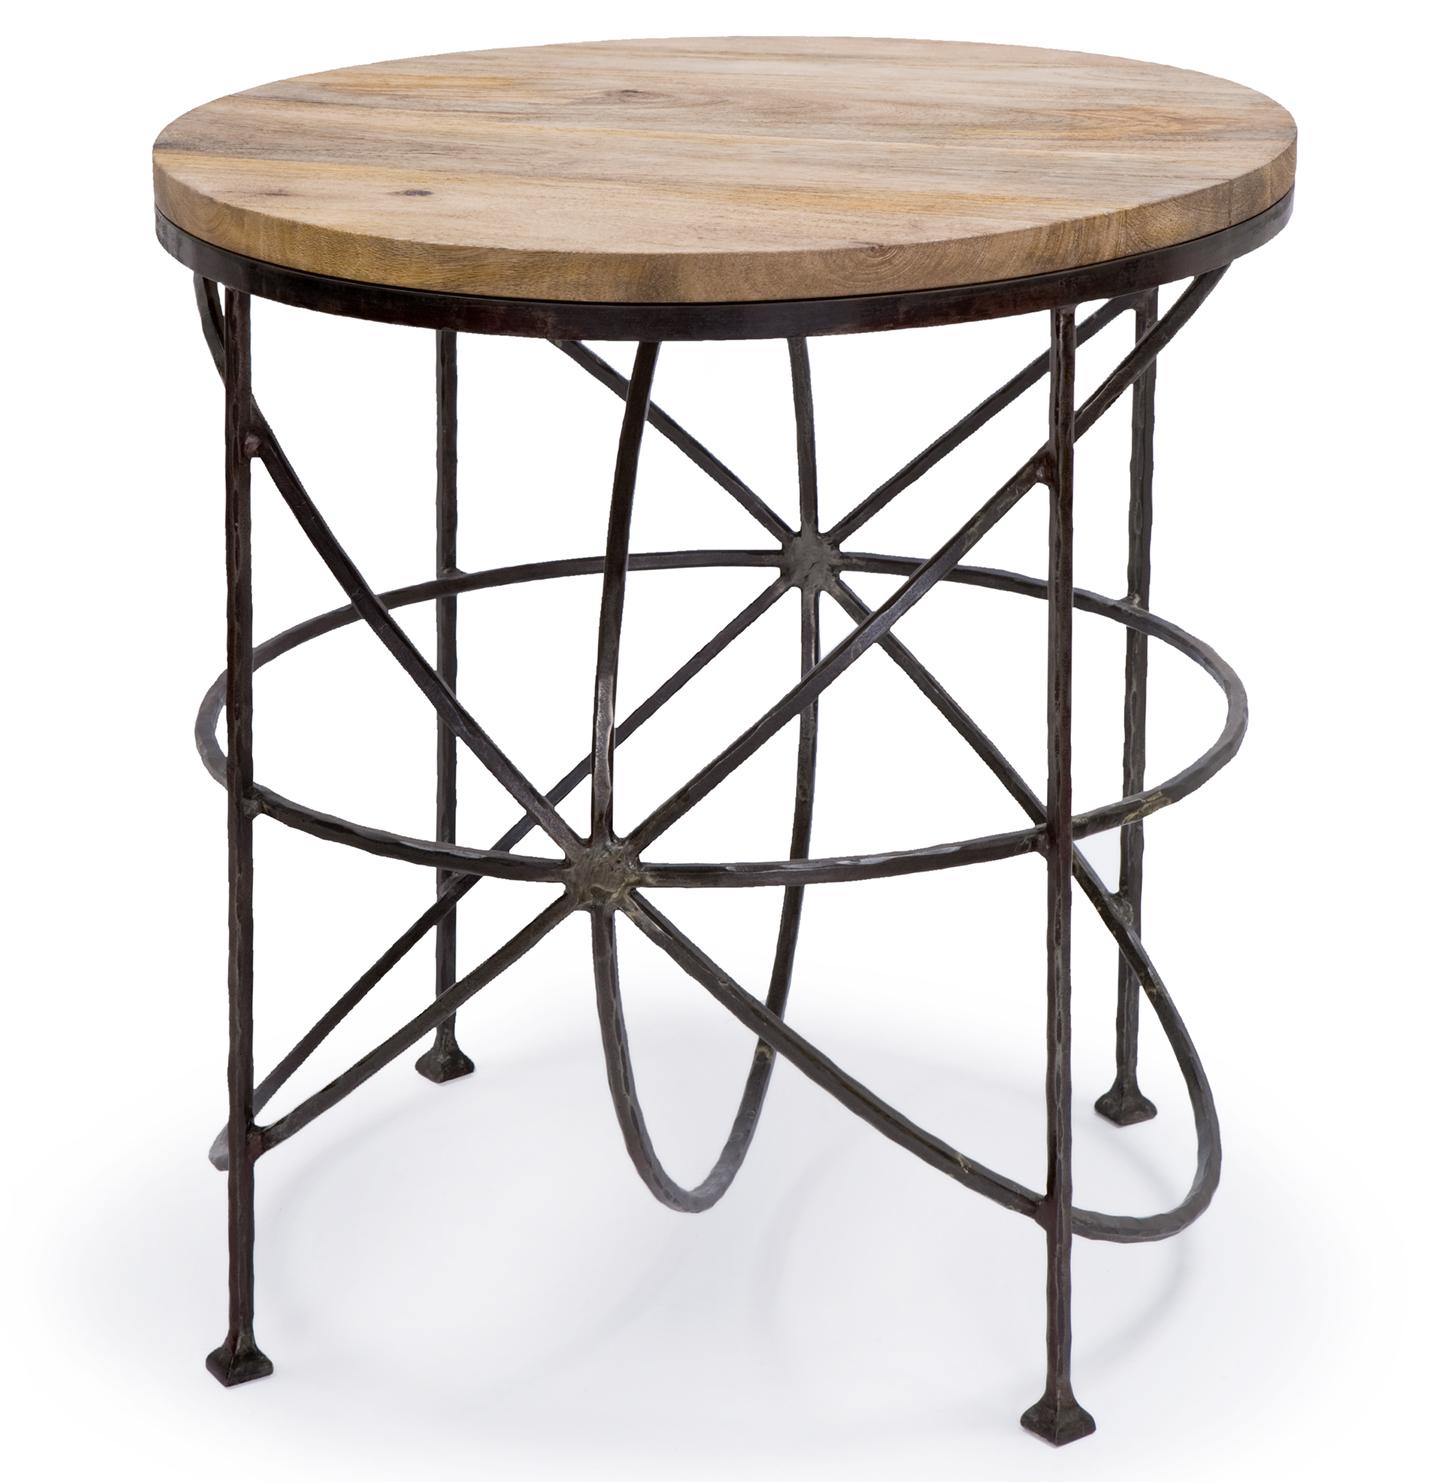 Alchemy Rustic Industrial Loft Wood Iron Orbit Round Side Table